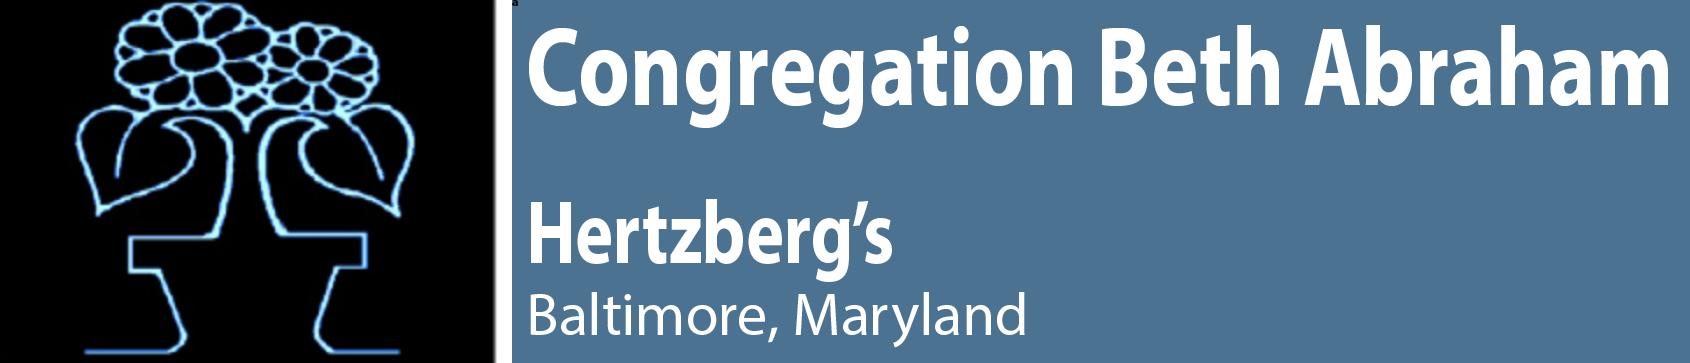 Congregation Beth Abraham Hertzberg's